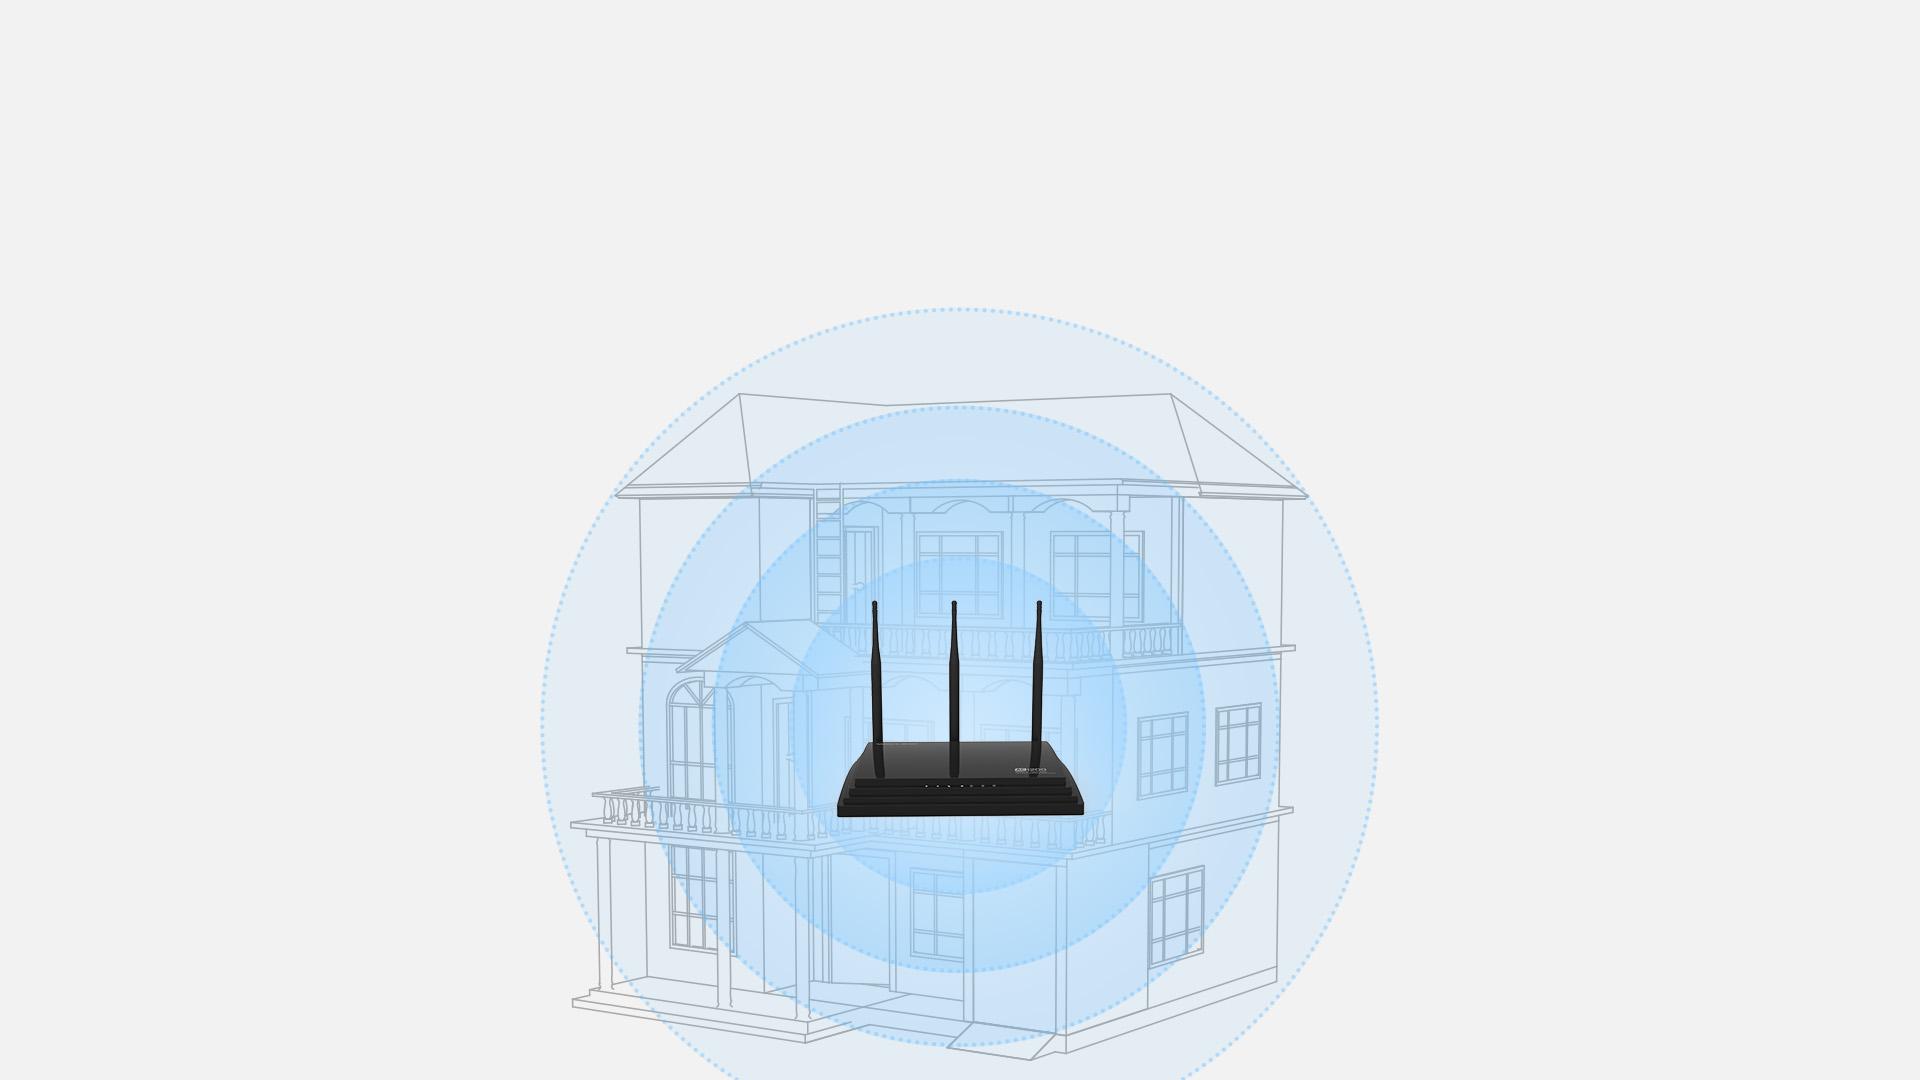 3x5dbi高增益天线,wifi覆盖无死角